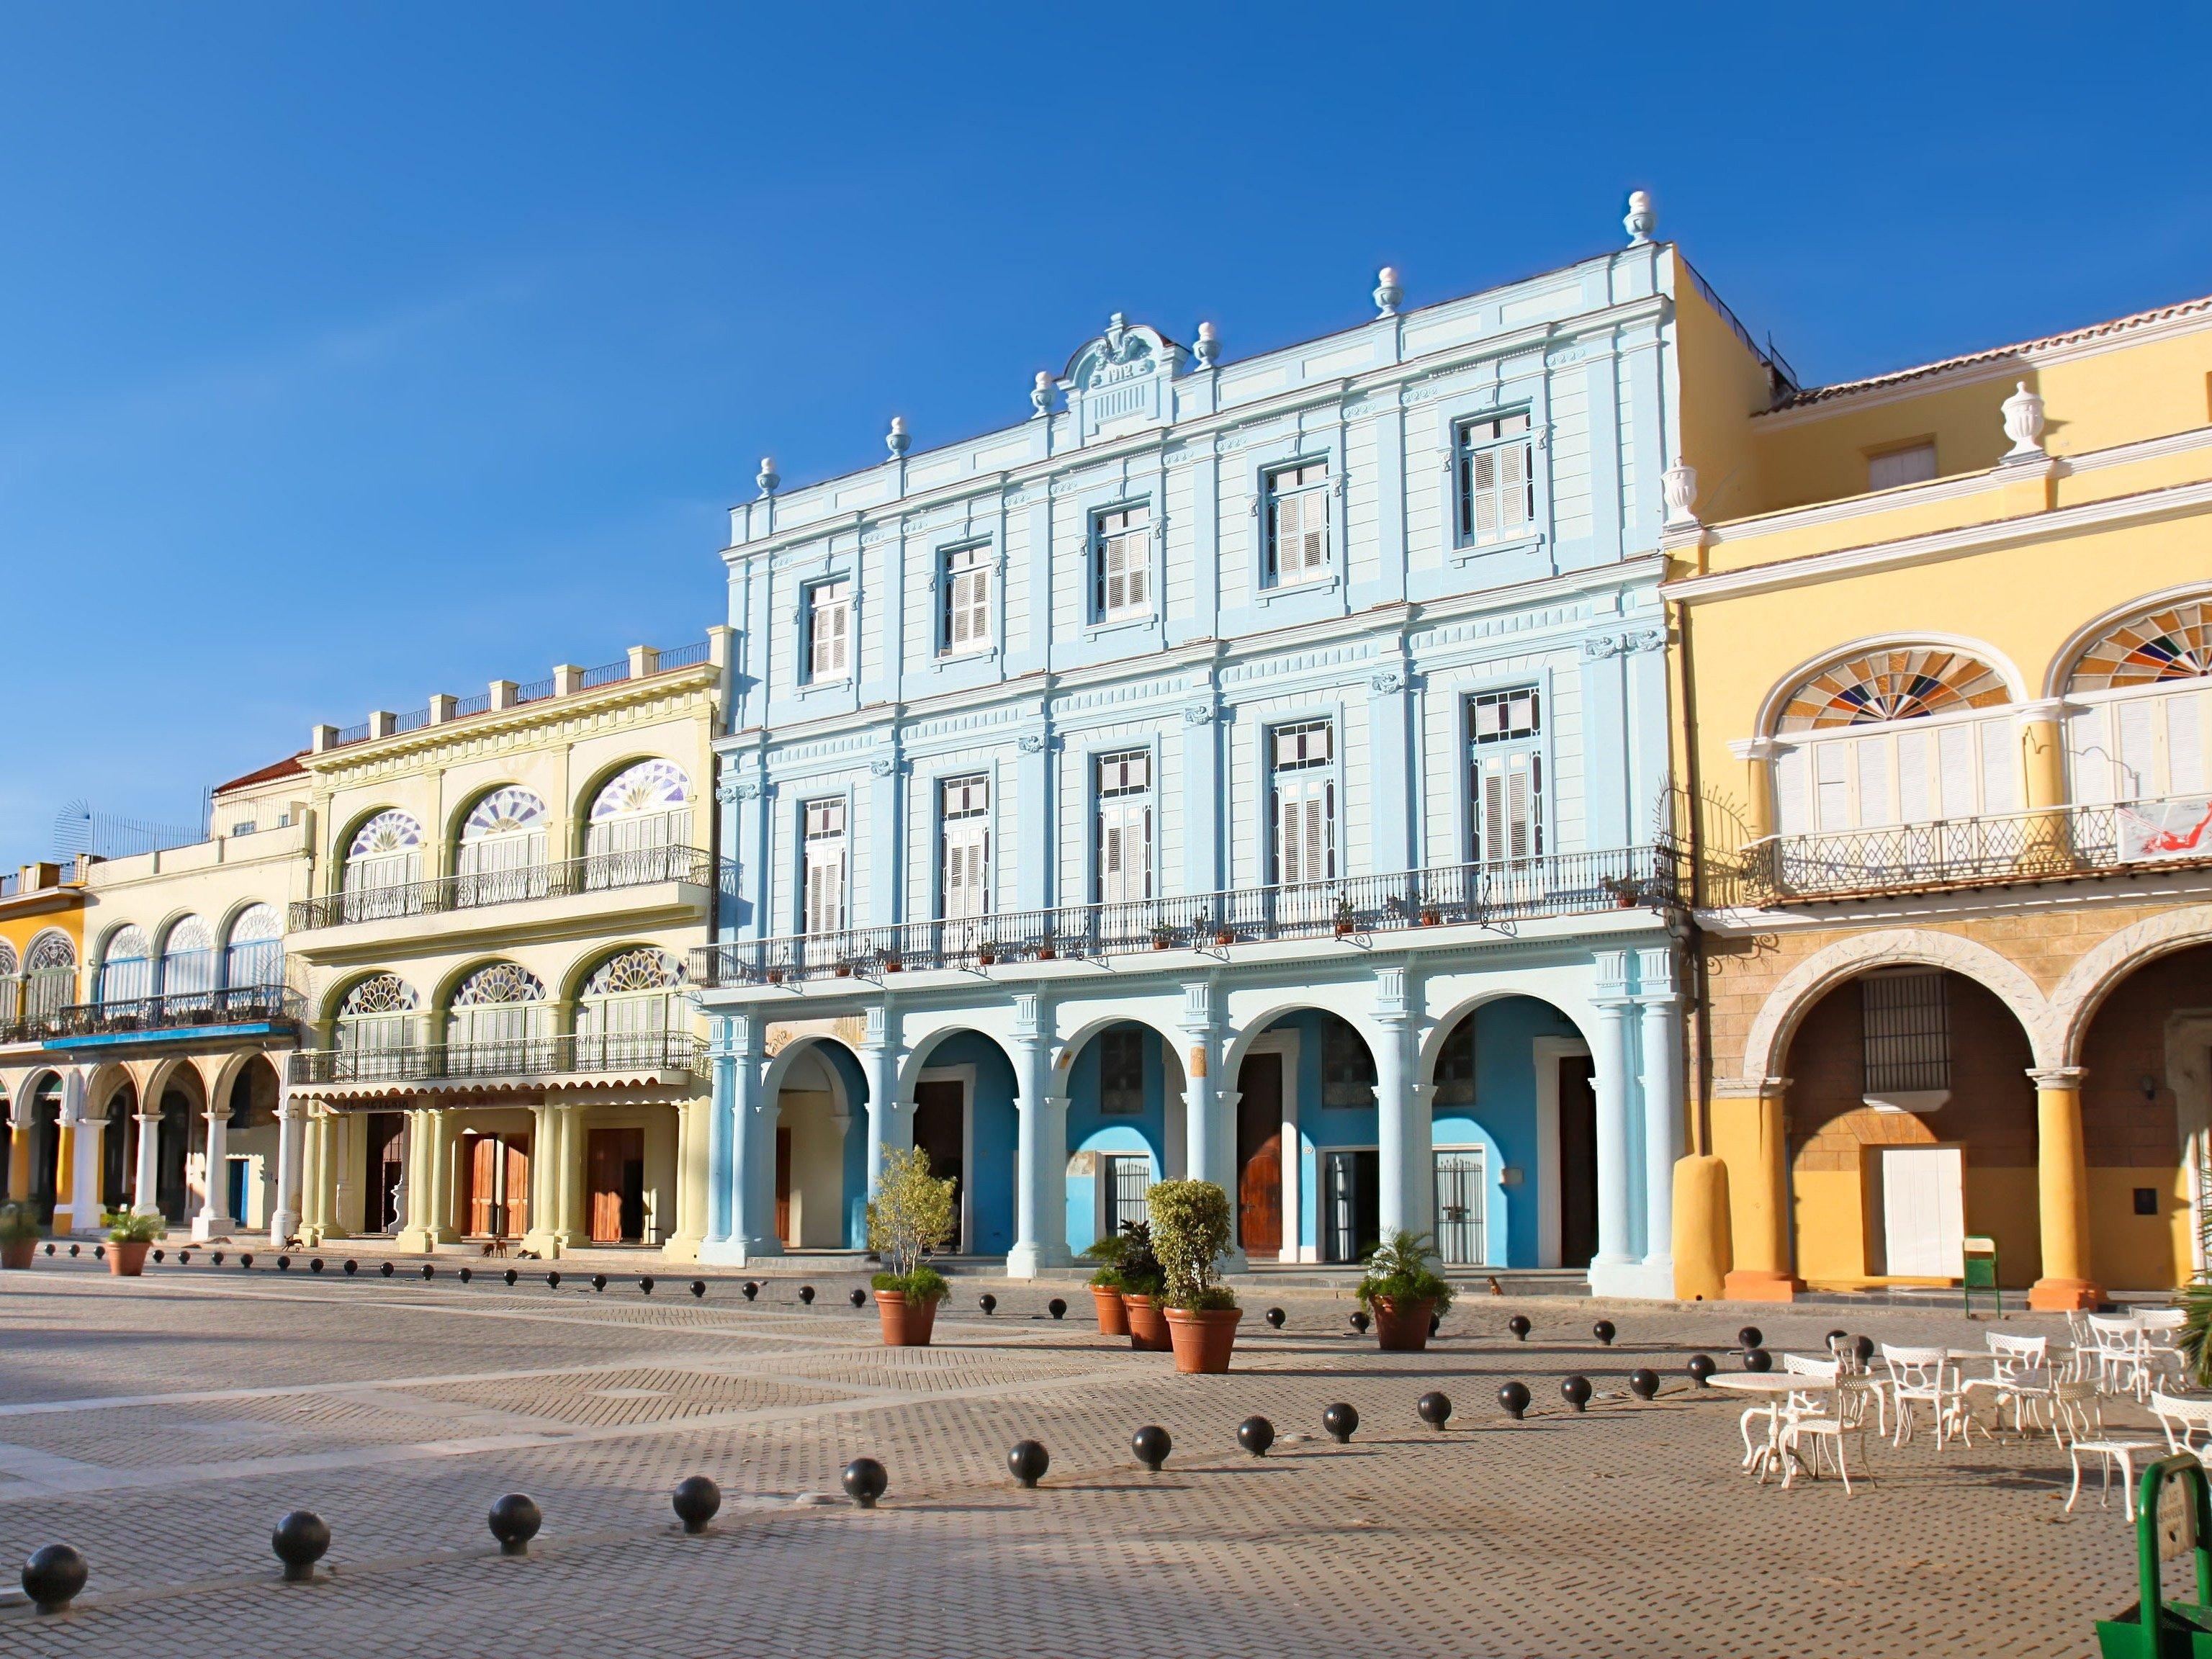 4. Habana Vieja, Havana, Cuba